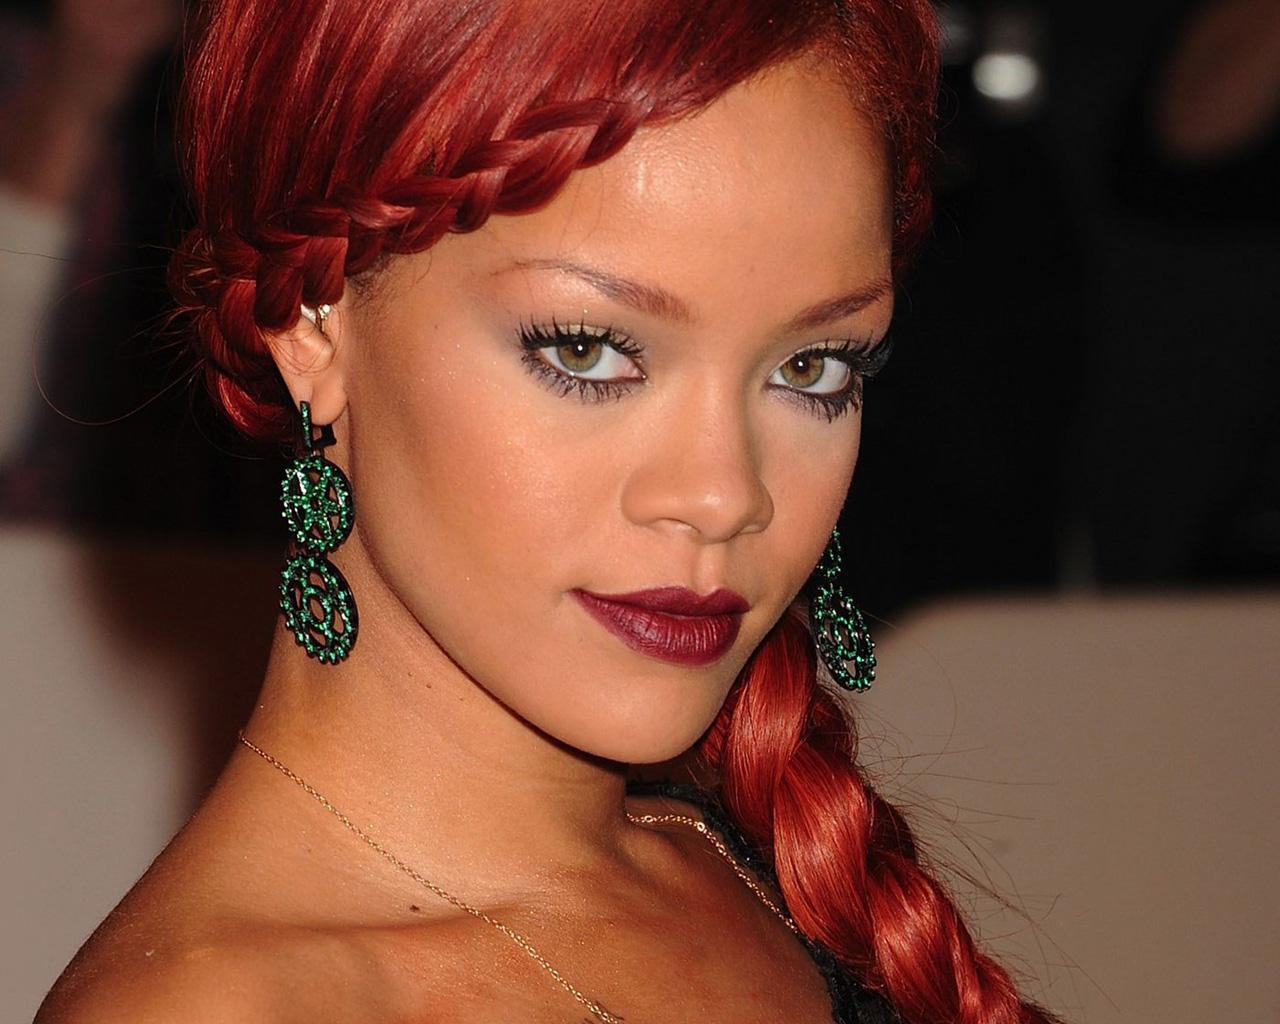 Rihanna Hairstyles: Rihanna Braid Hairstyles